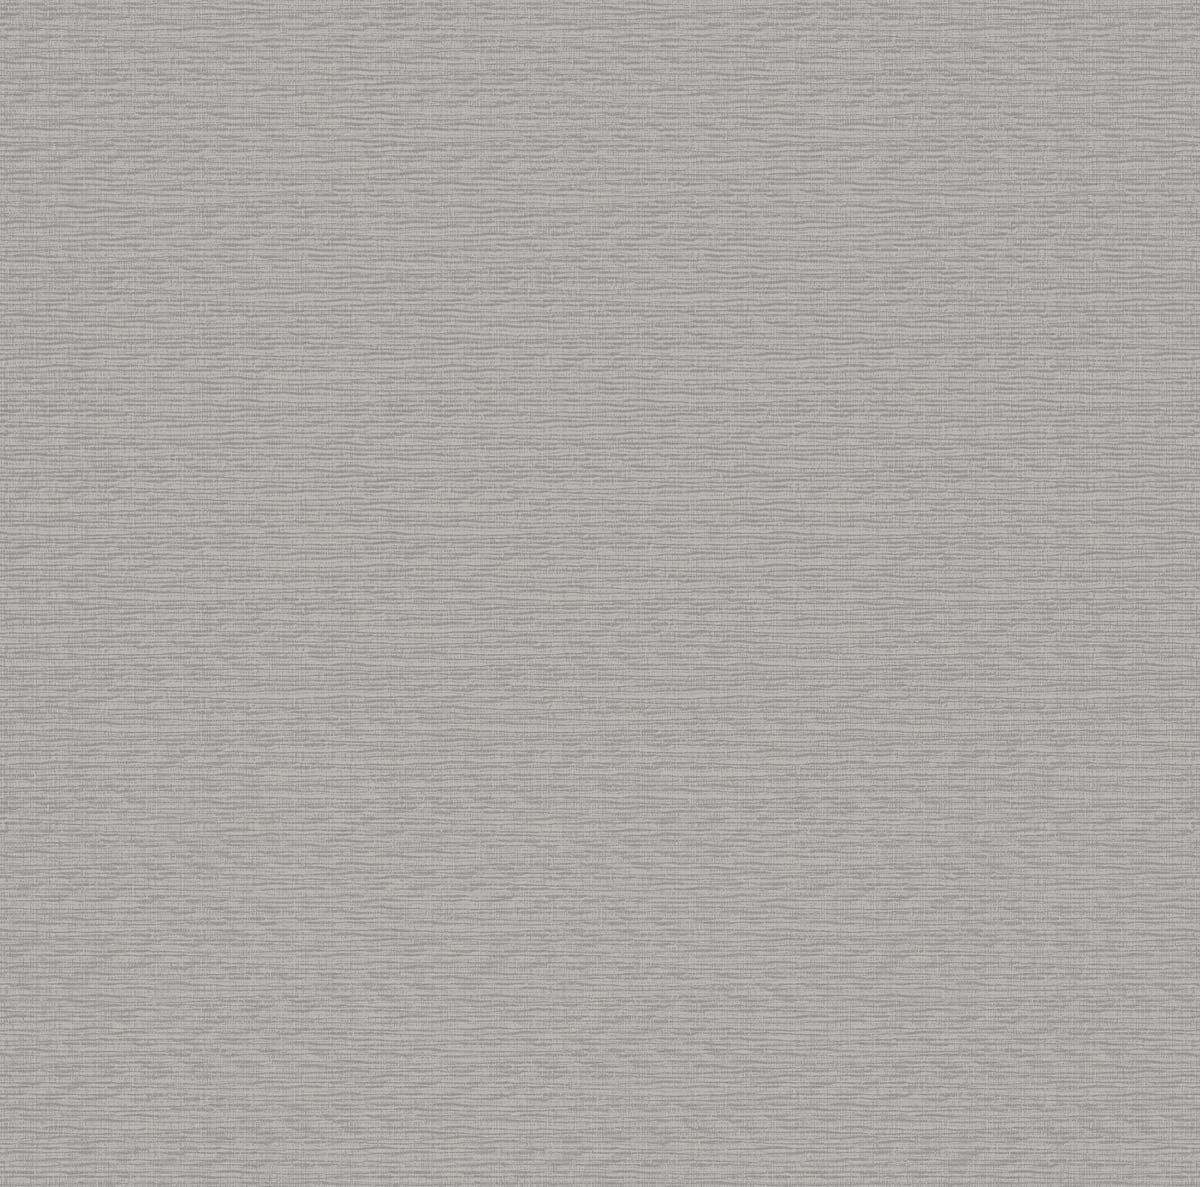 Pagoda-wallpaper-seagrass-MH00410